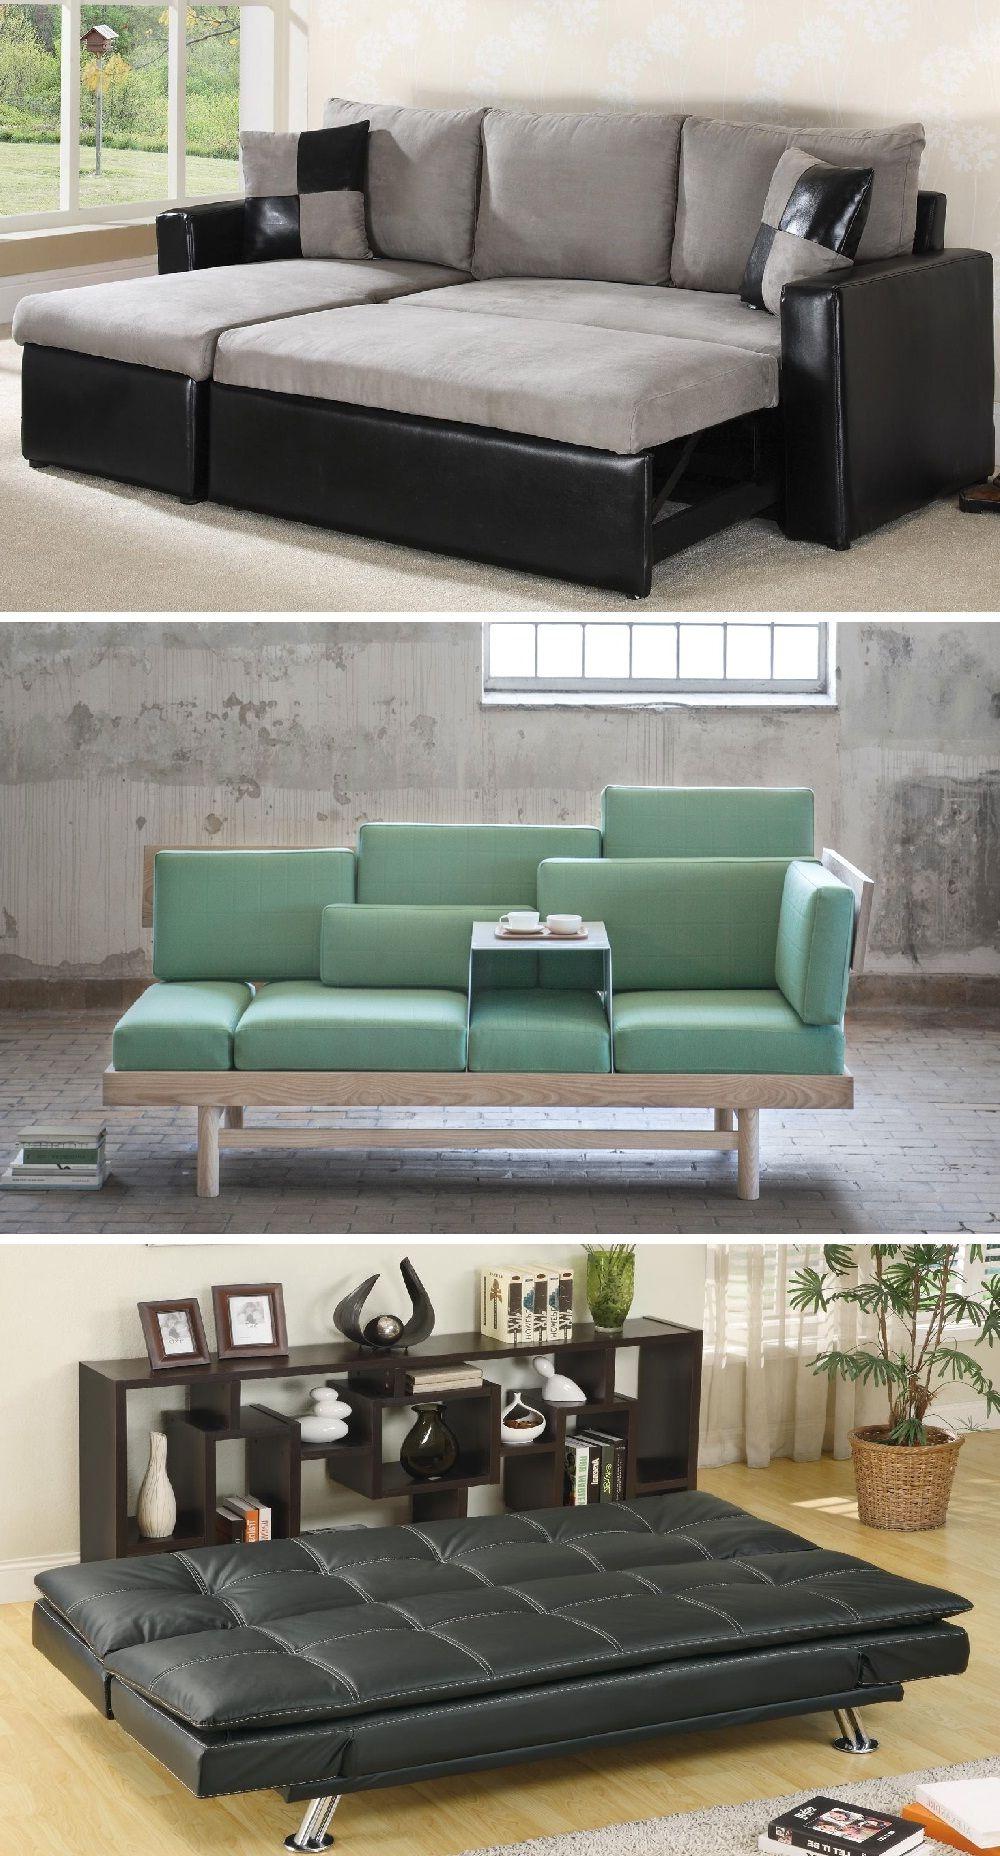 Alternative To Sleeper Sofa Coffee Tables Ideas